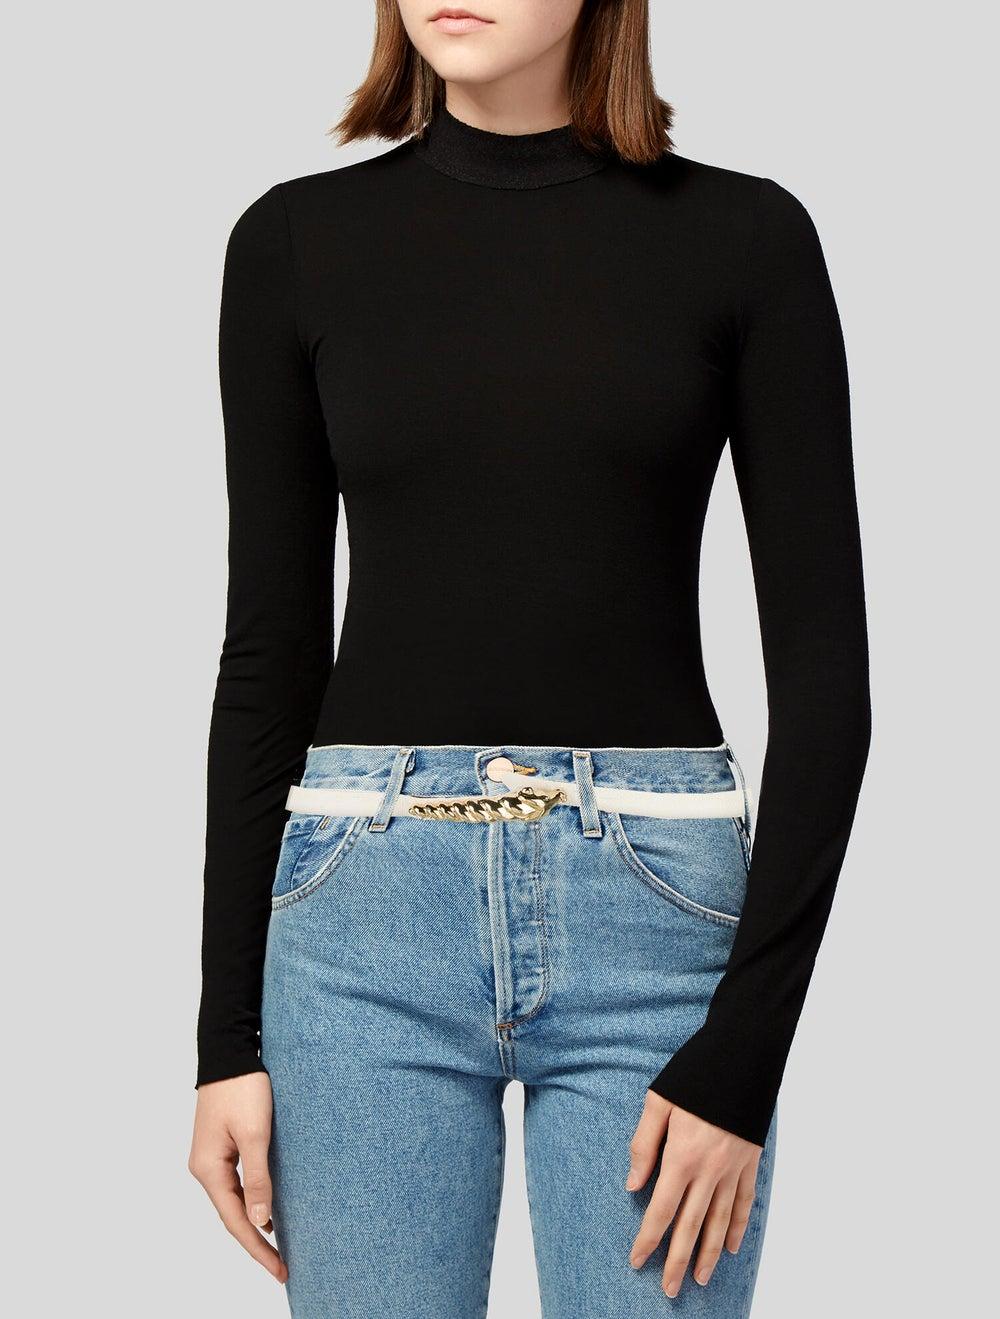 Judith Leiber Leather Hip Belt White - image 2